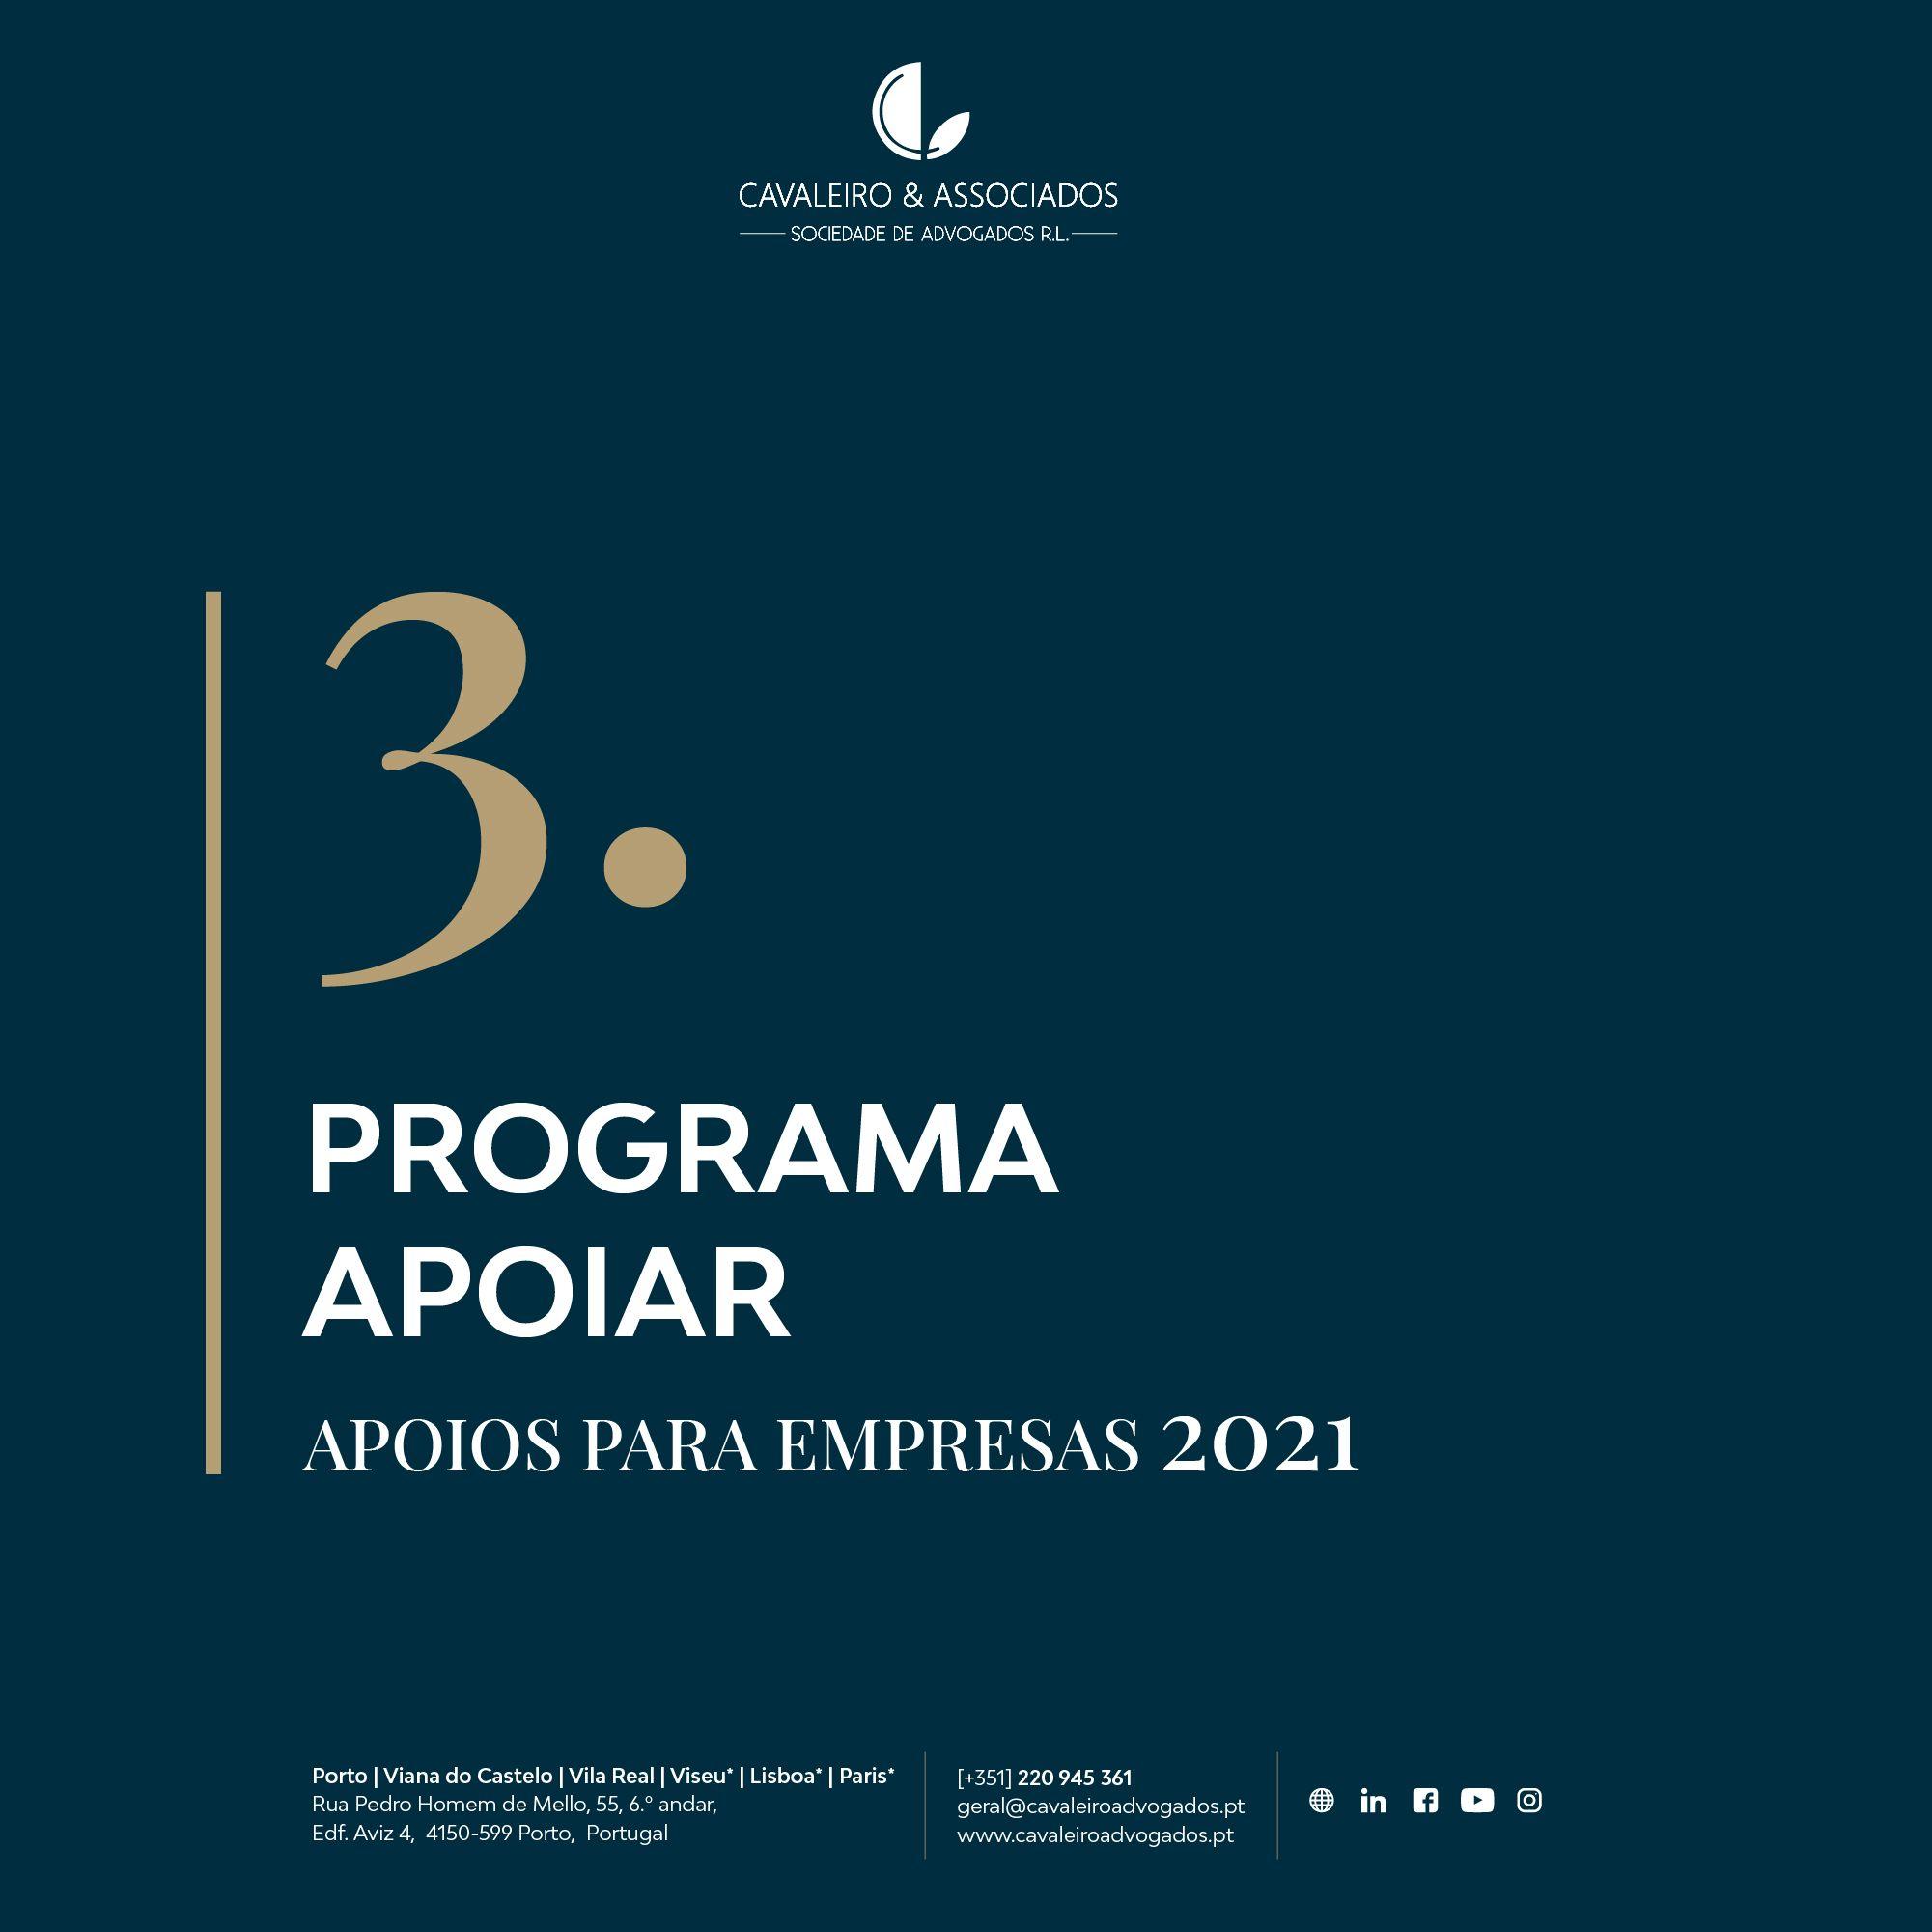 3. PROGRAMA APOIAR I APOIOS PARA EMPRESAS 2021